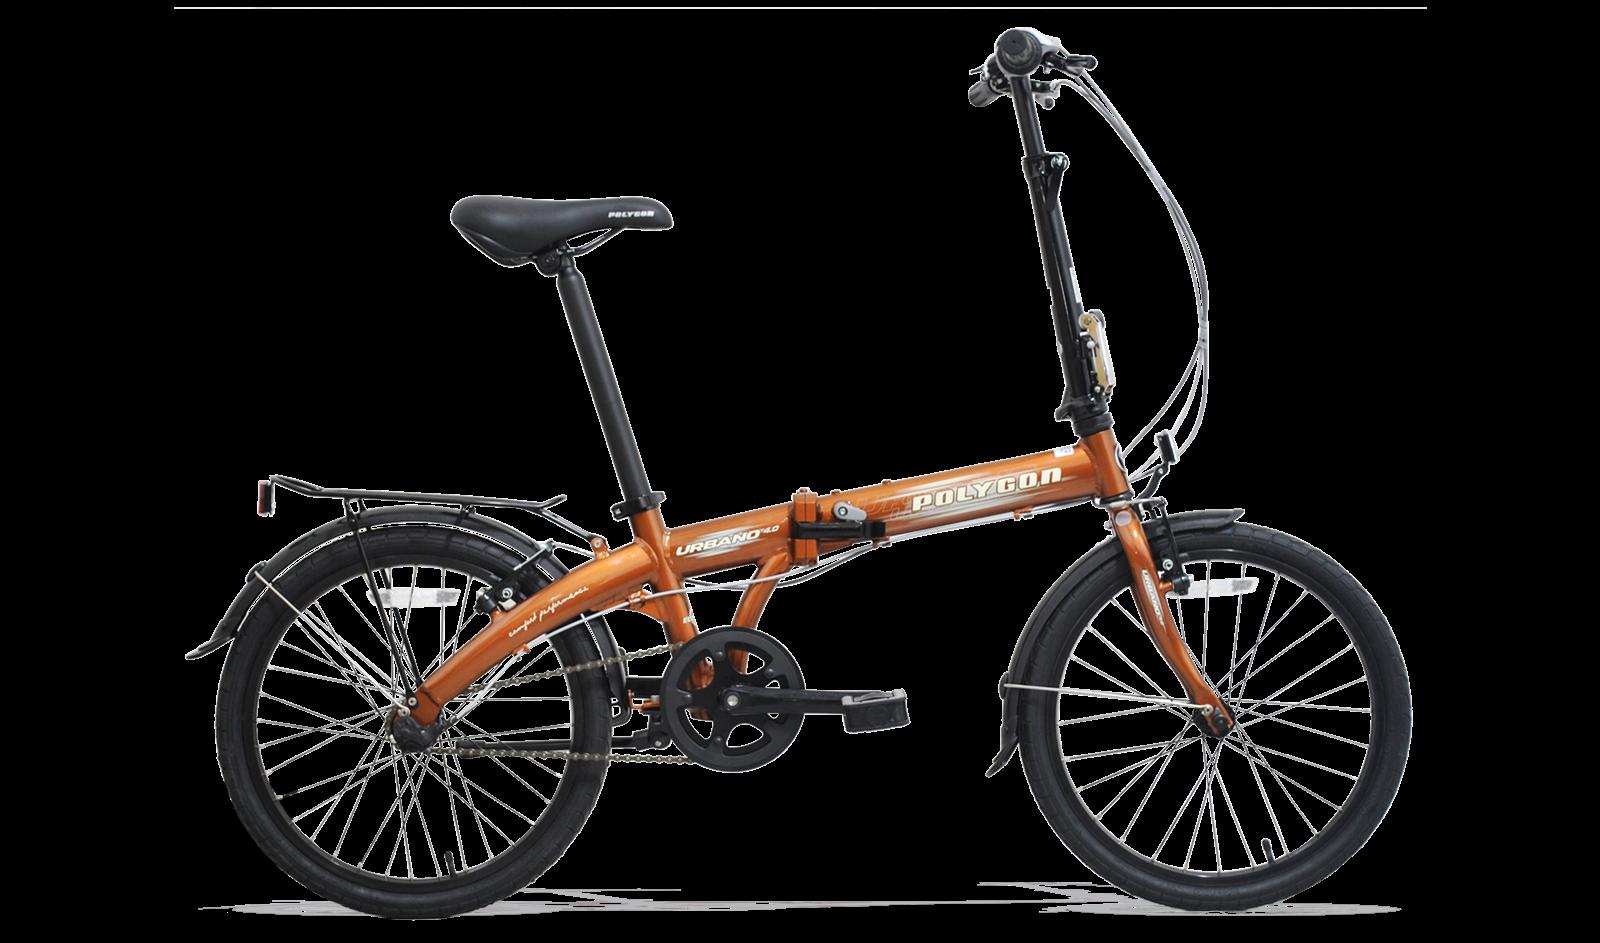 Bike Rental And Tours Surabaya Surabaya Bike Rental